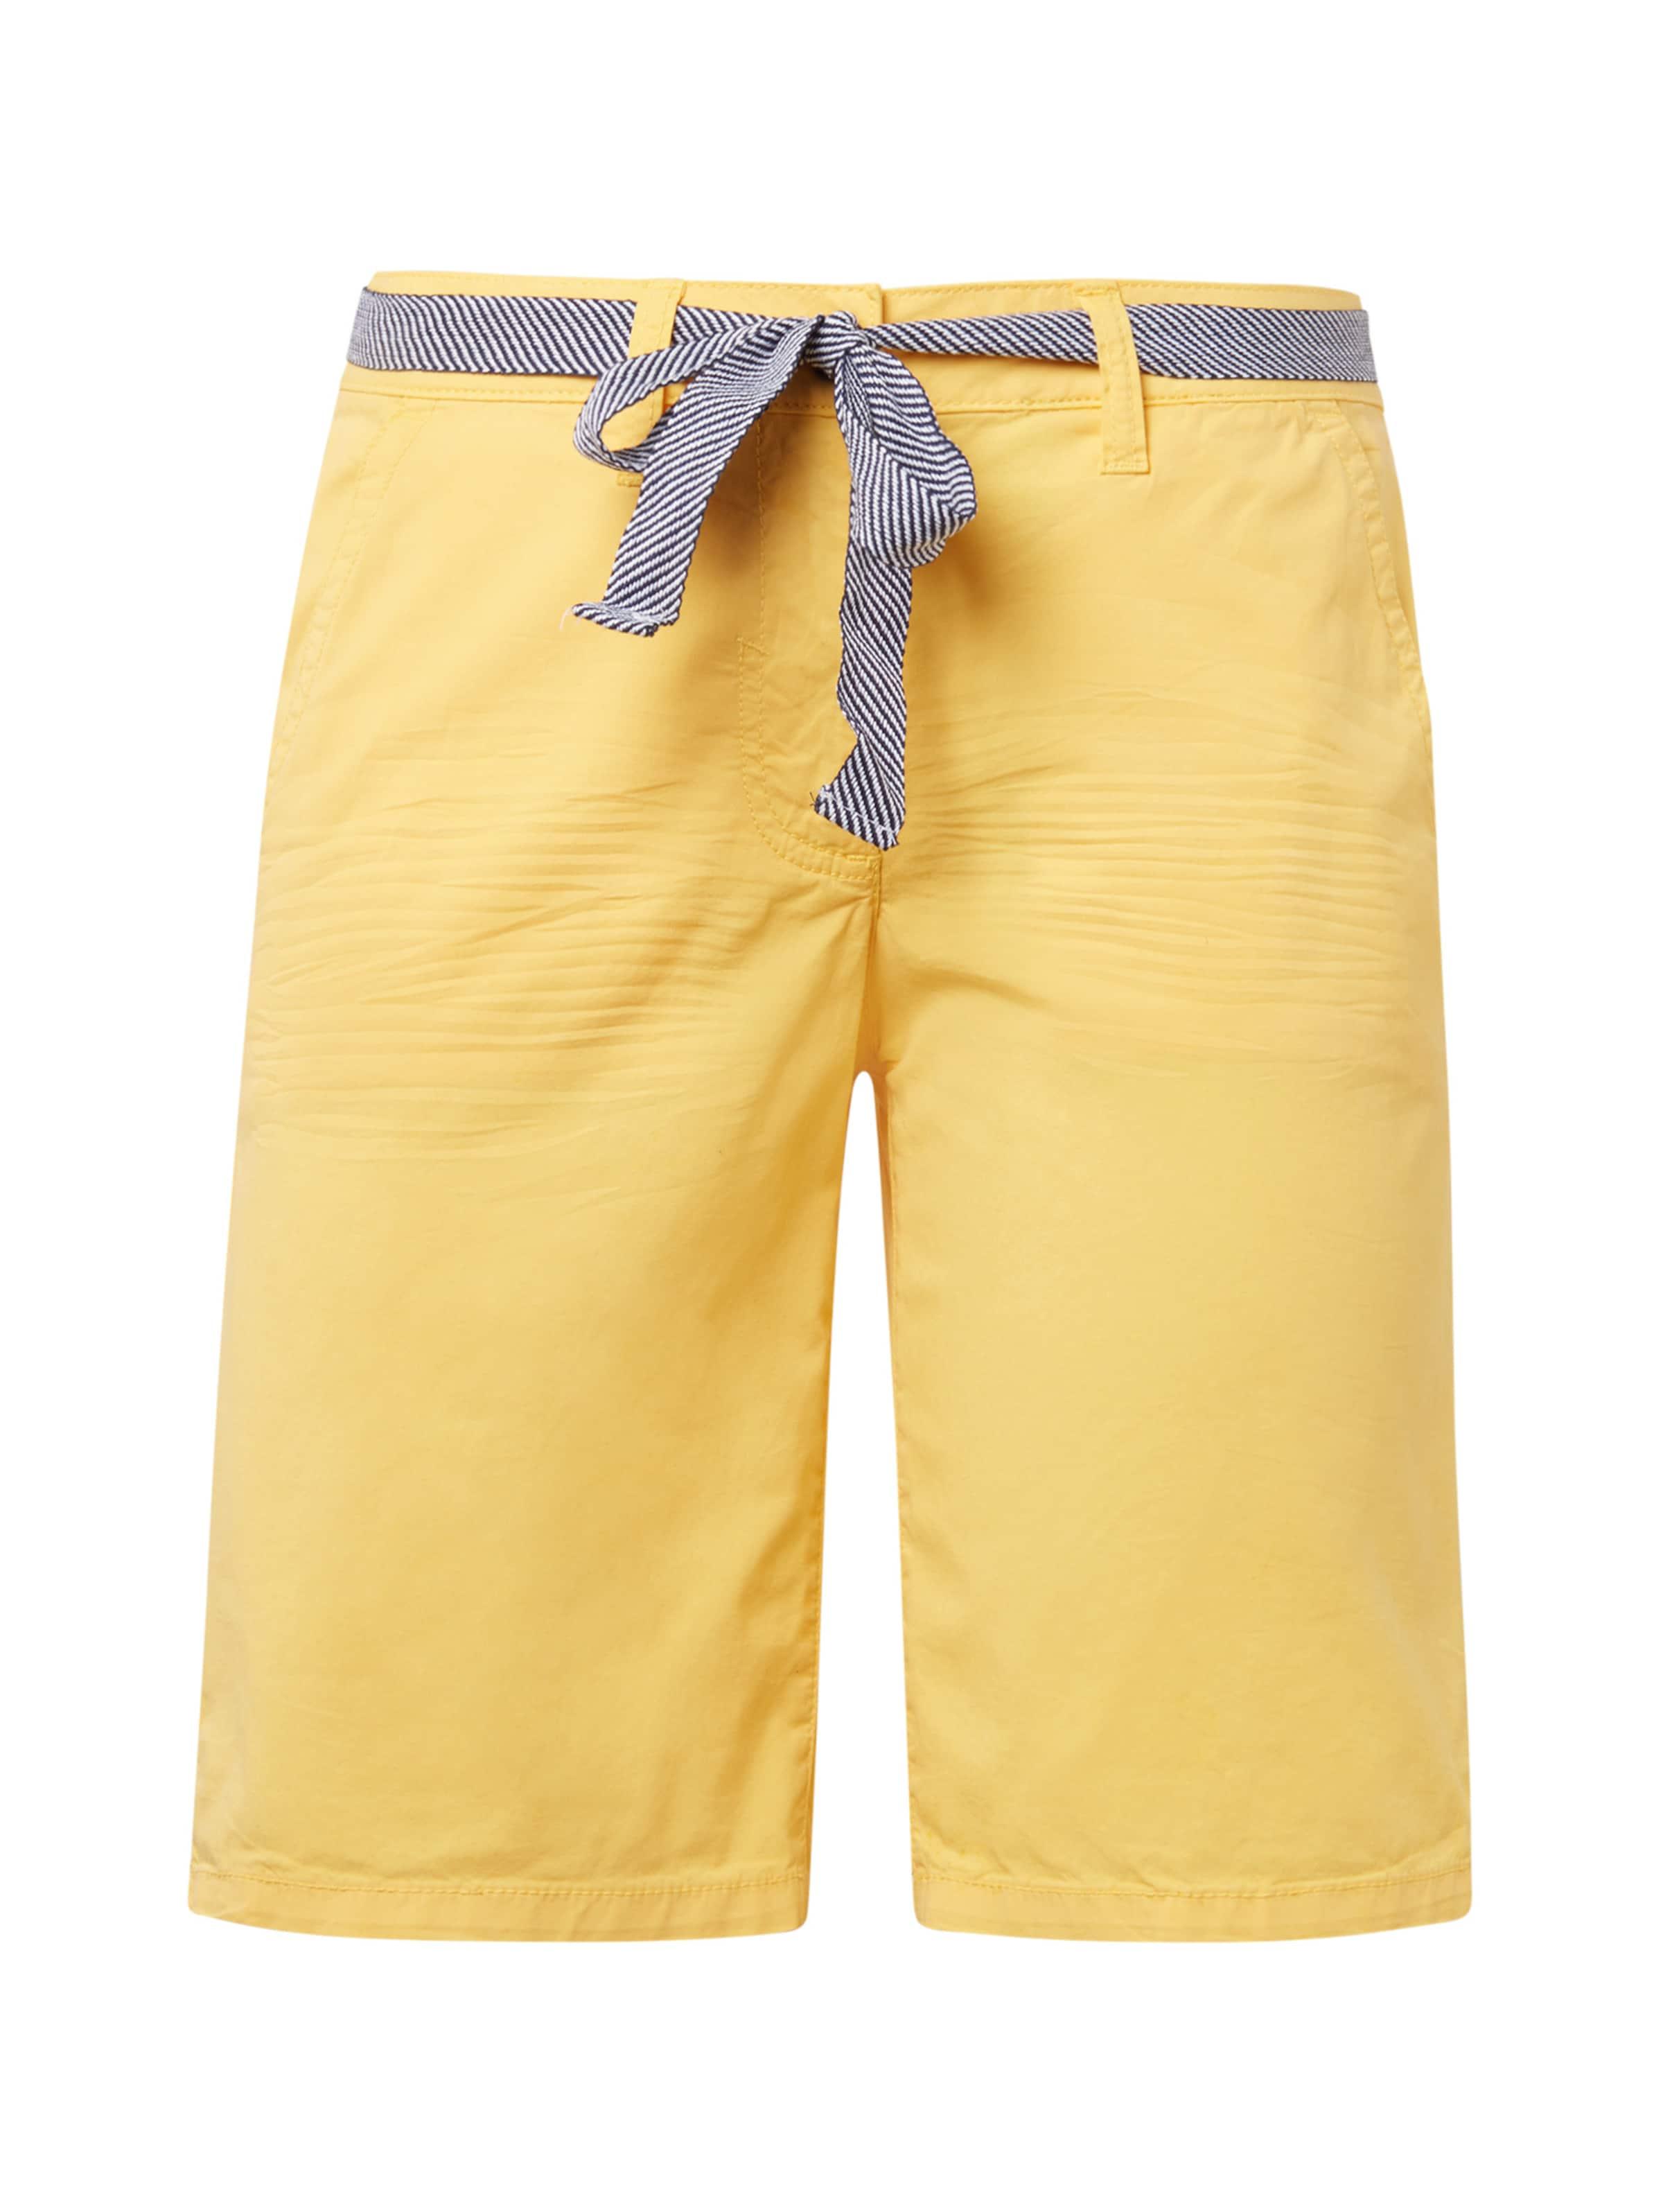 Tailor En Pantalon Tom Chino Jaune QoBCrxdeW